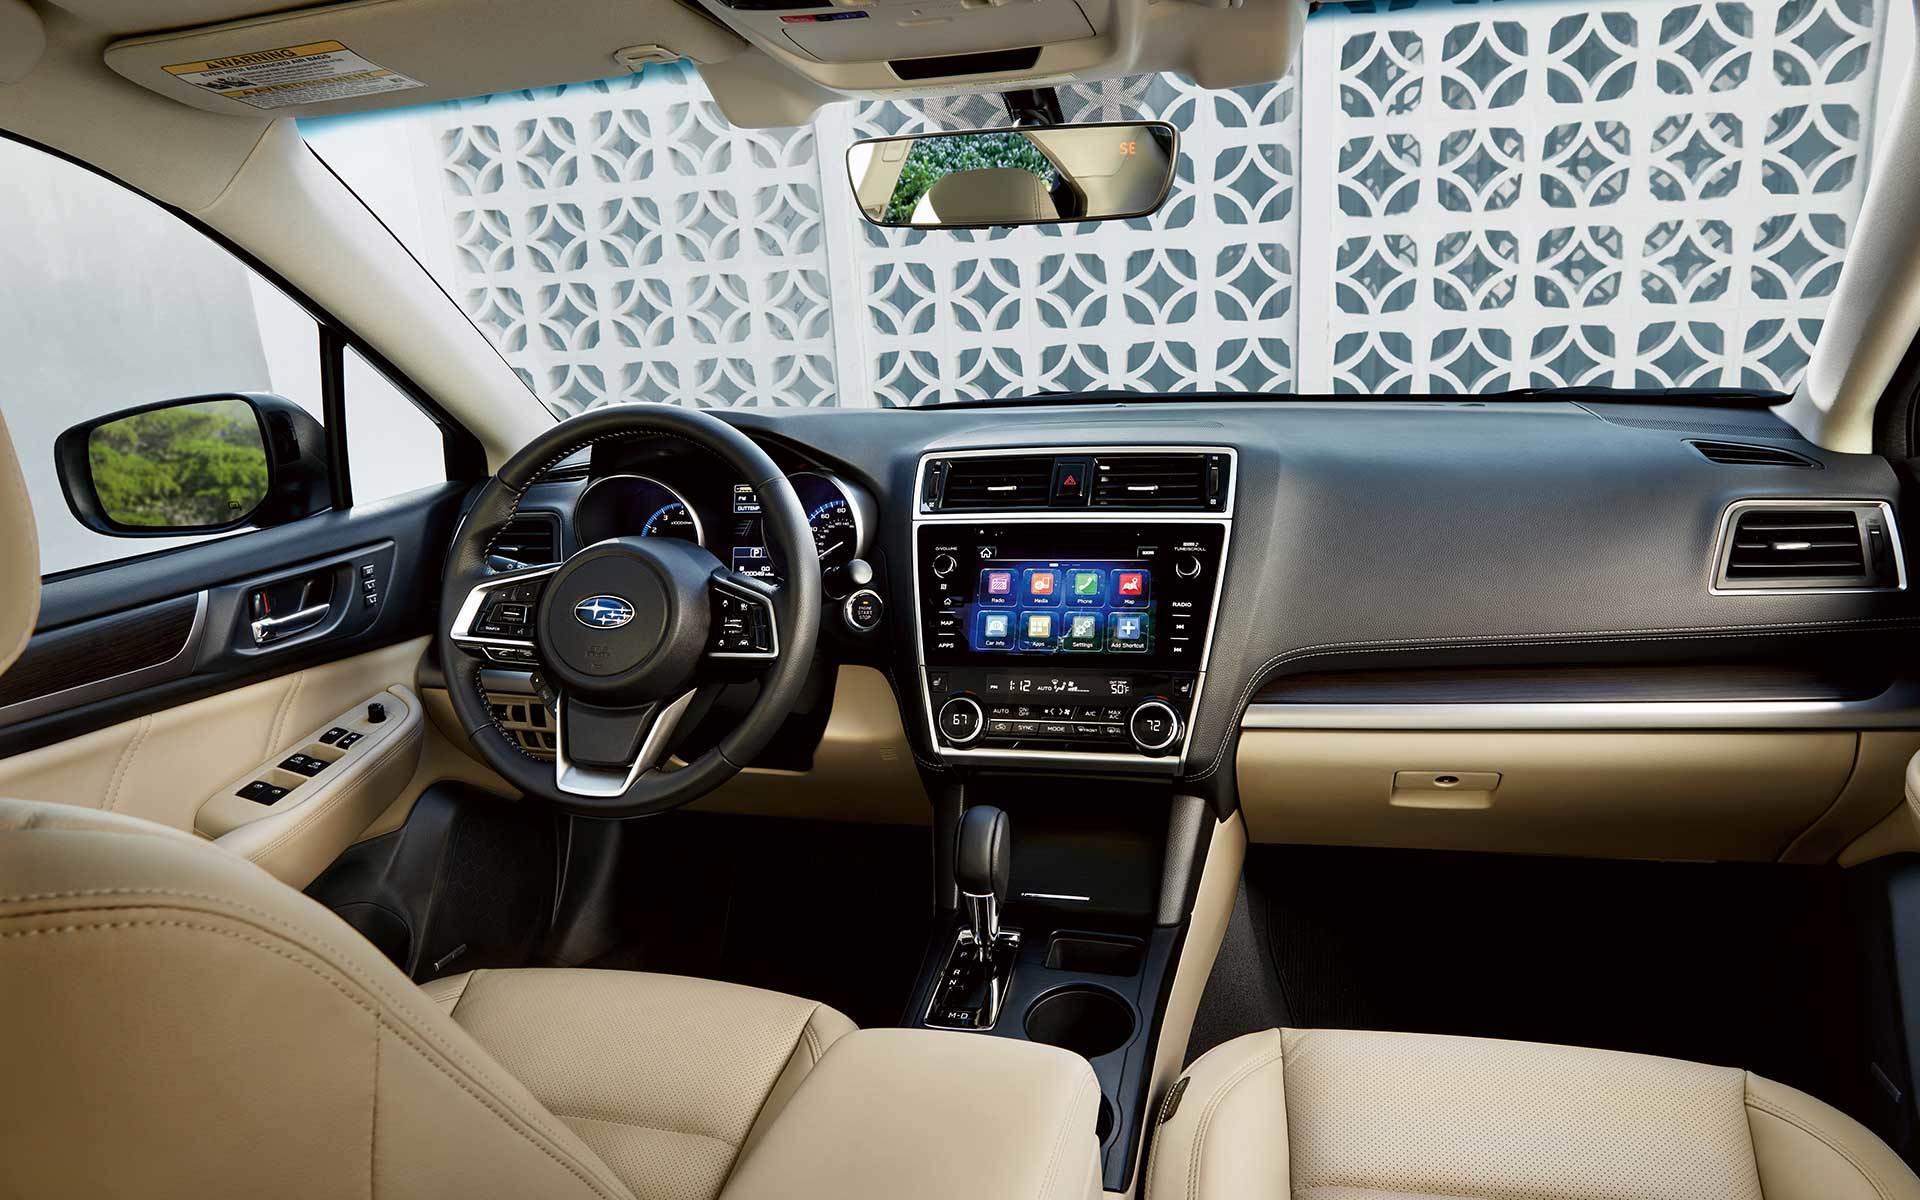 Subaru Legacy Lease Specials Deals Commerce Township Mi Fuel Filter Location Interior Options And Features